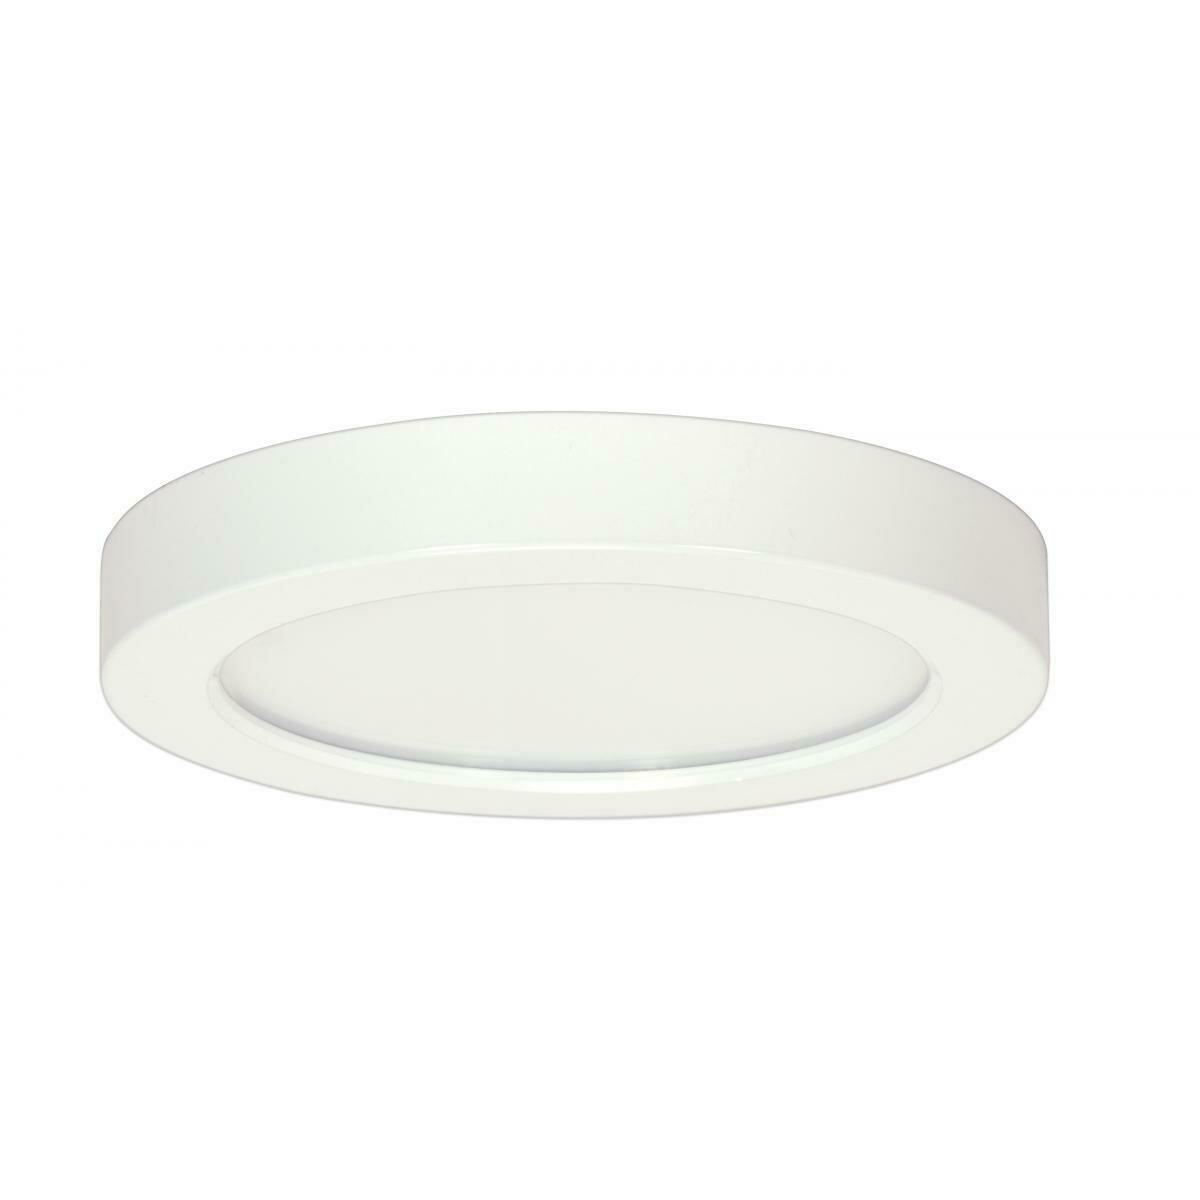 White Round LED Flush Mount (DISPLAY ONLY)